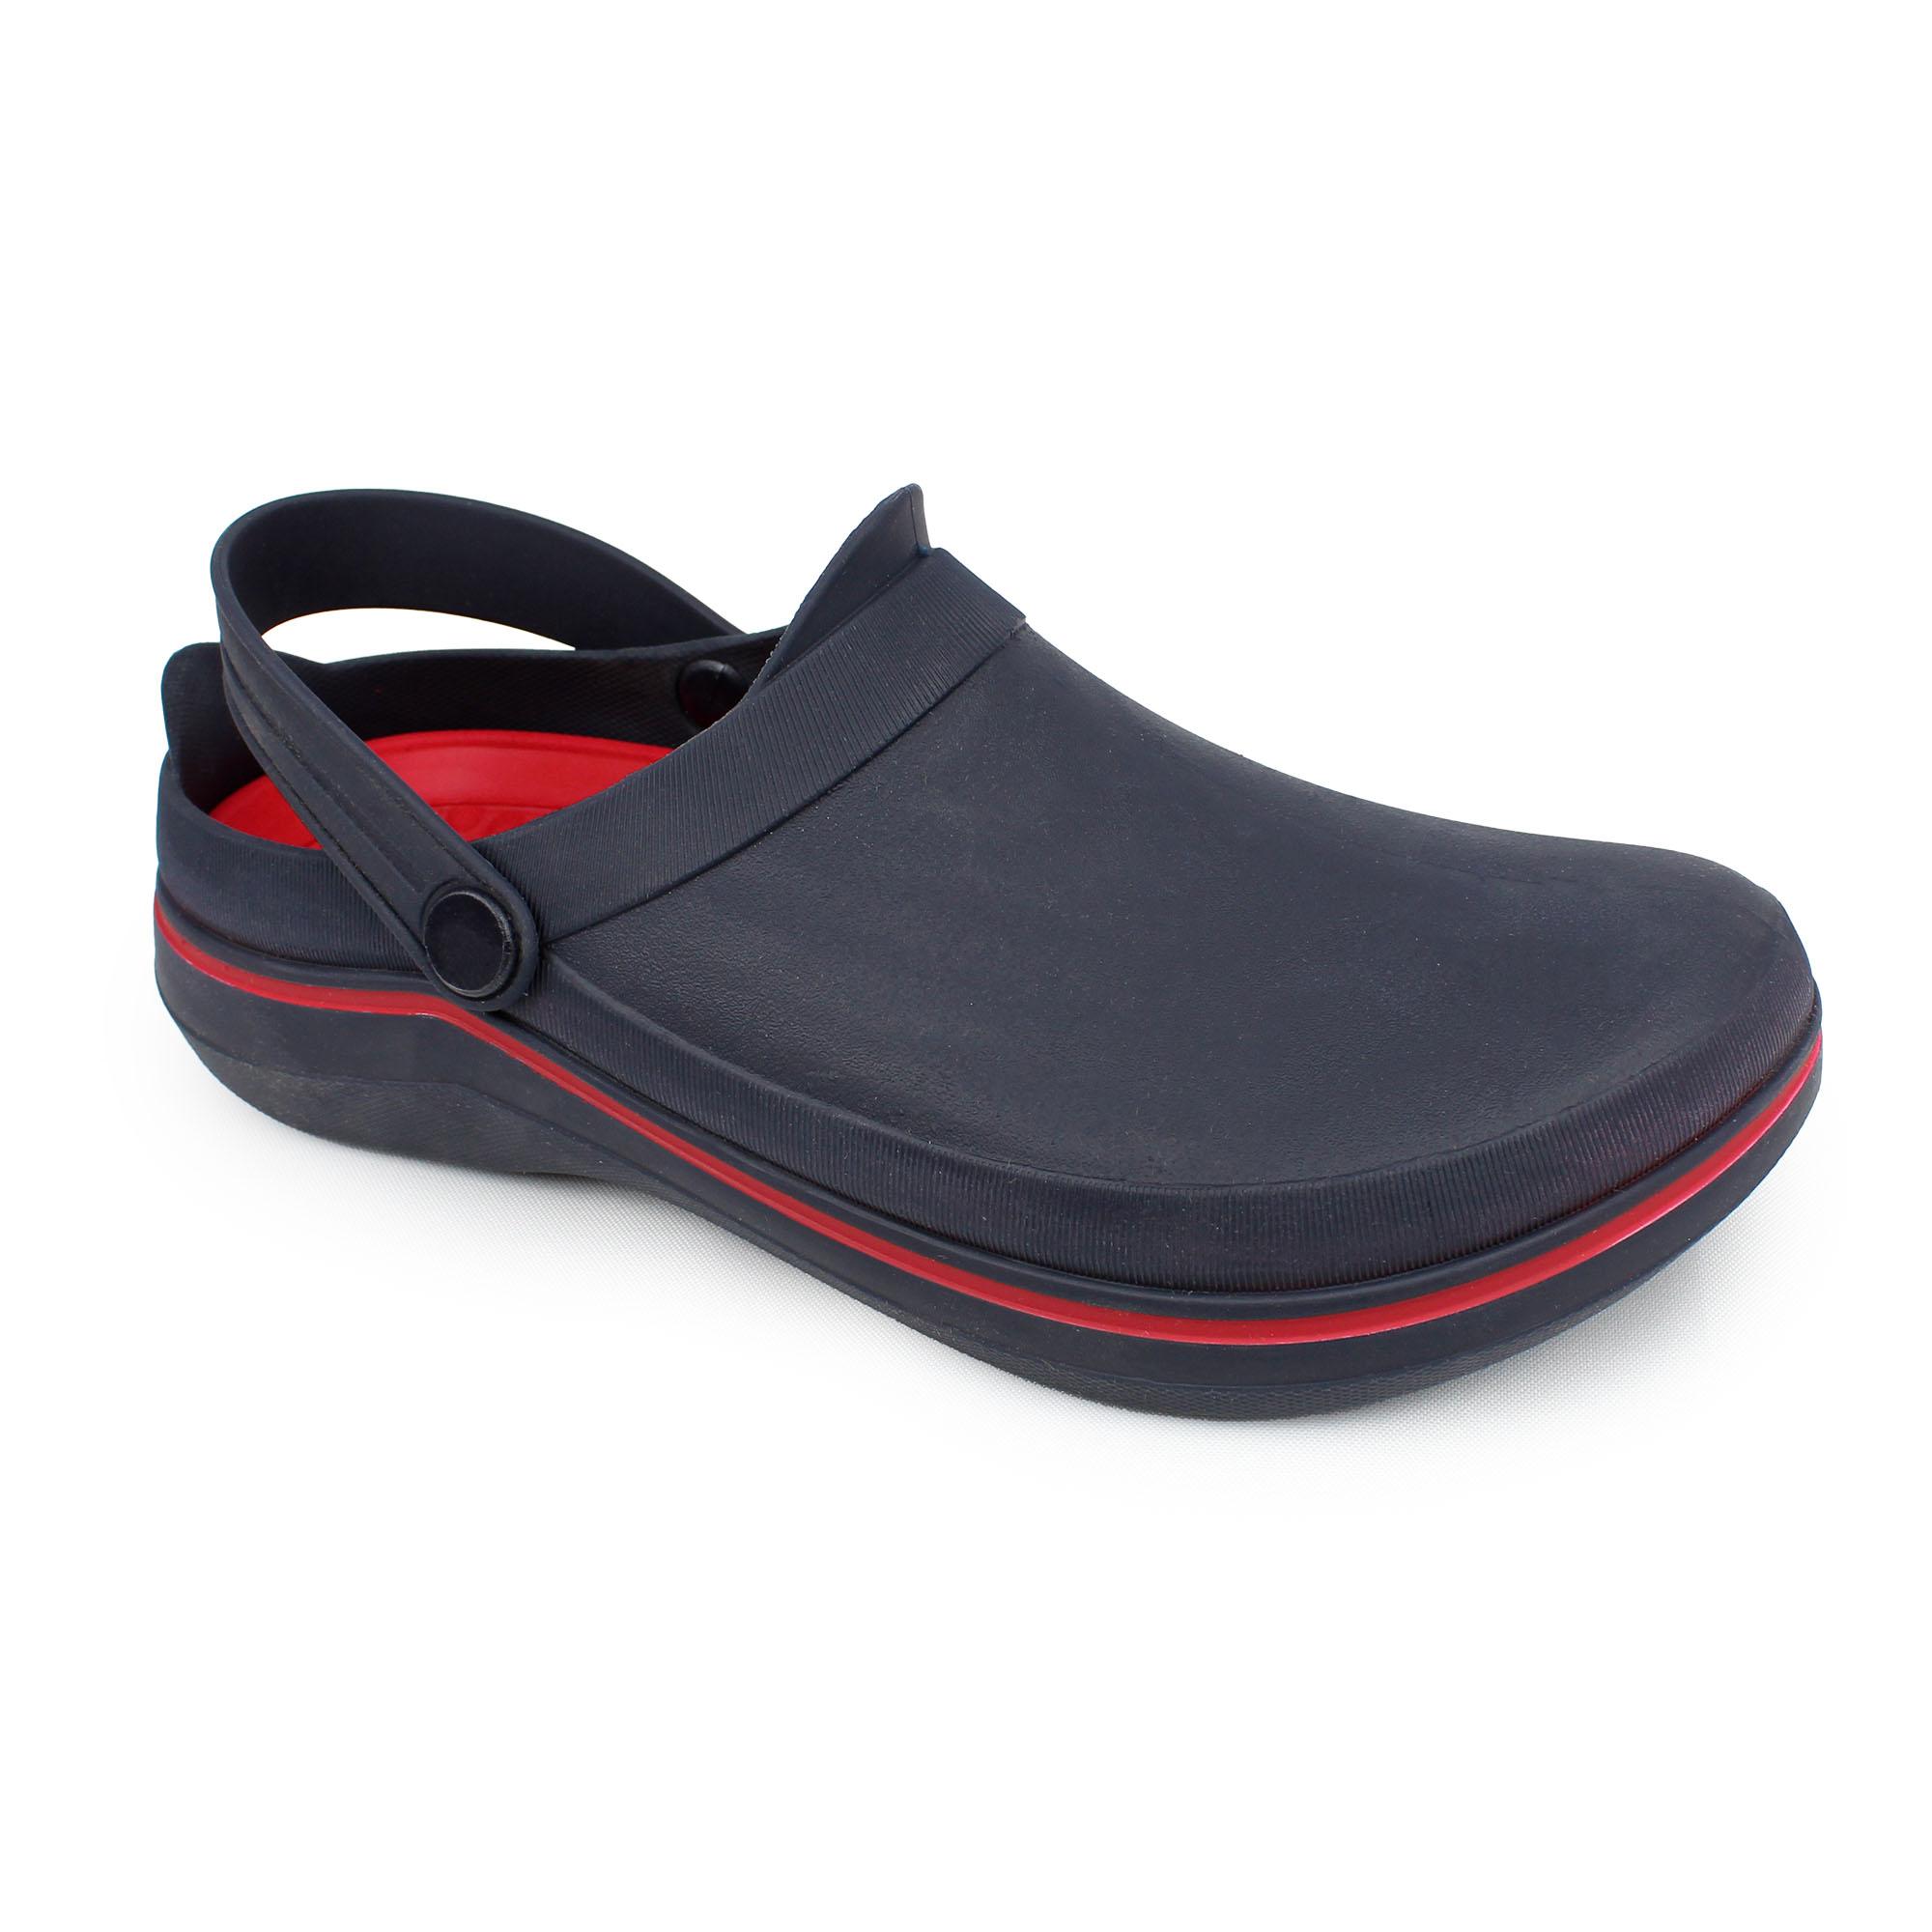 Crocs Masculino Boa Onda Safe 2043